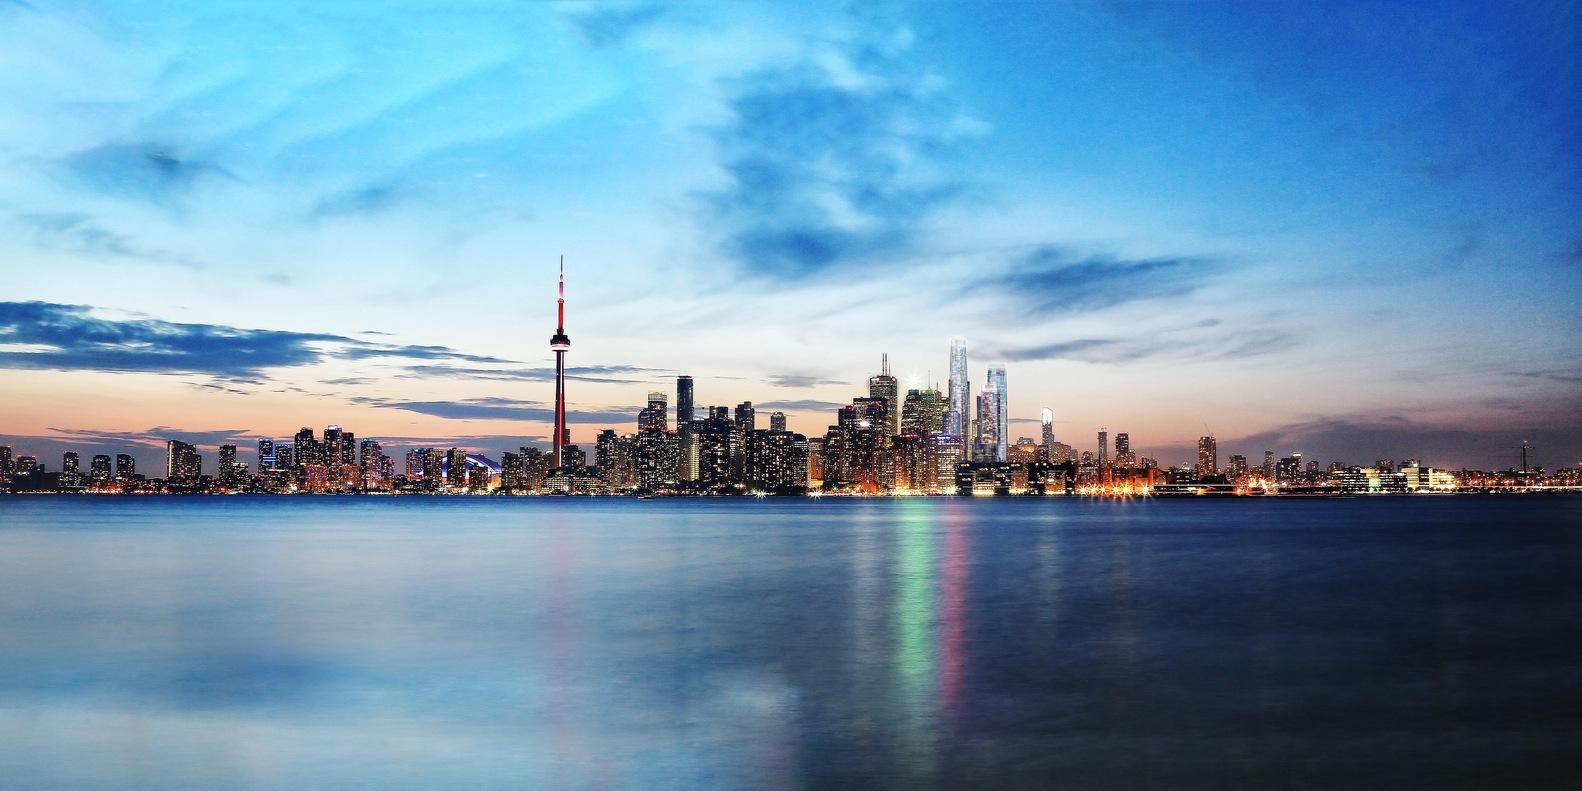 Набережная Торонто и бизнес-кластер One Yonge